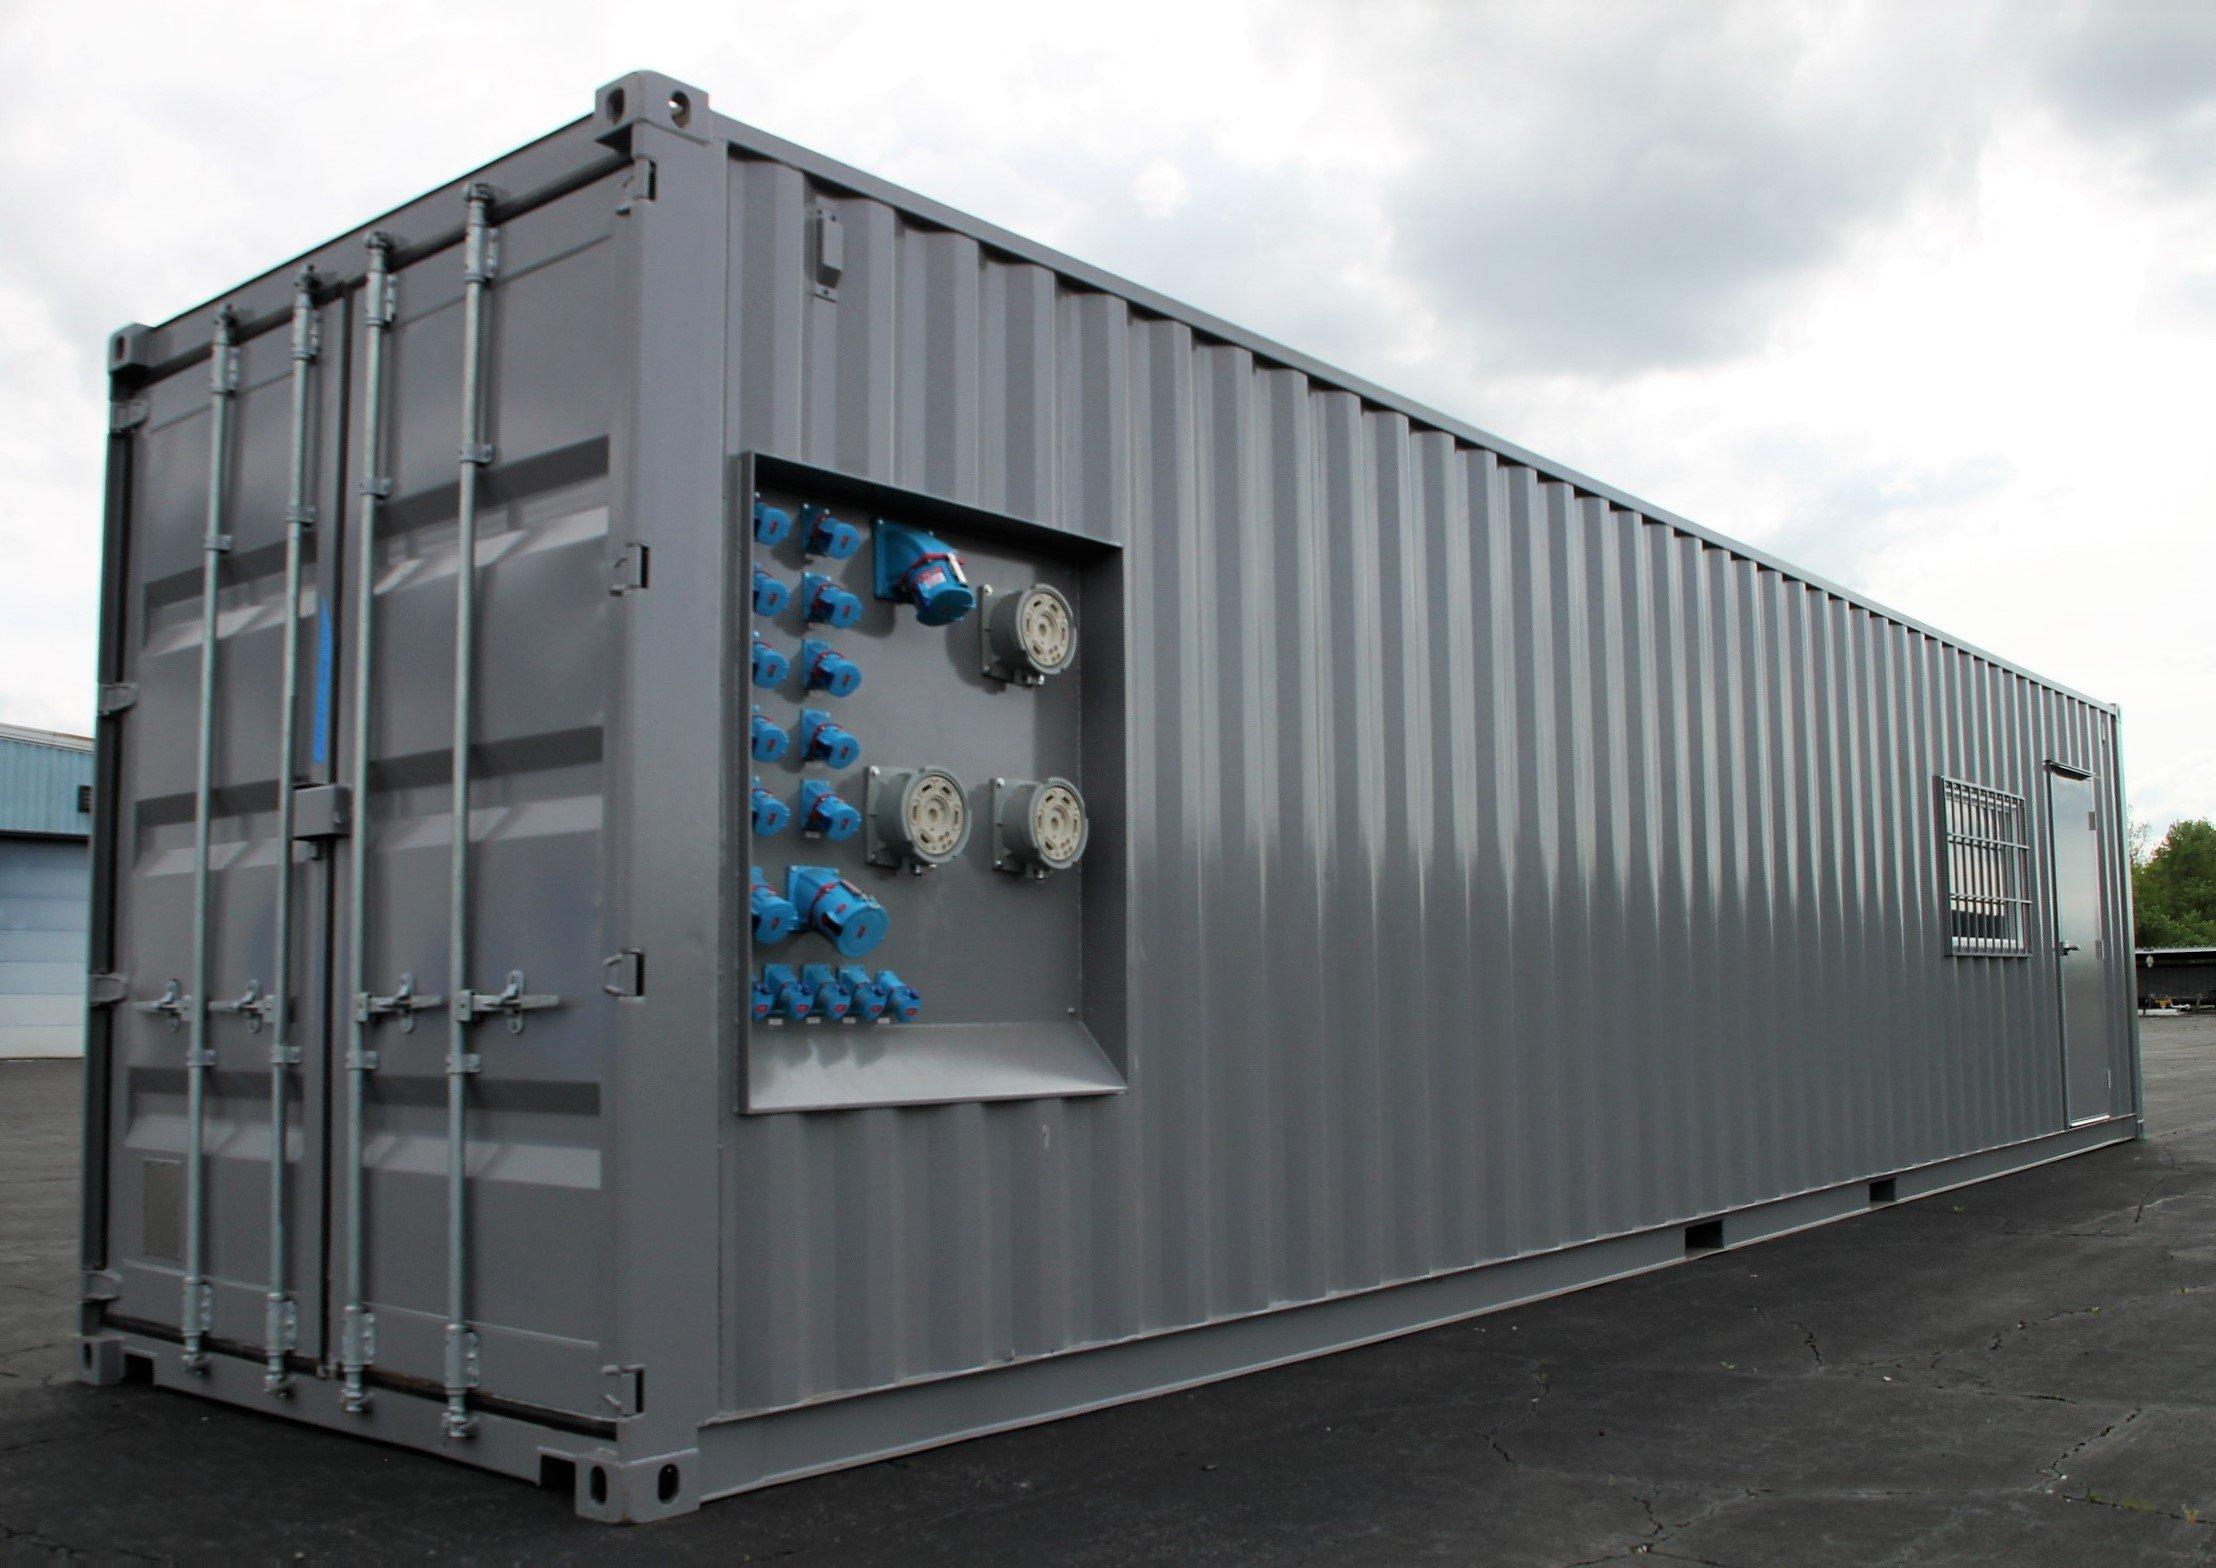 DropBox Inc, modular work station, portable work station, containerized work station, mobile work station, ReinventingTheBox